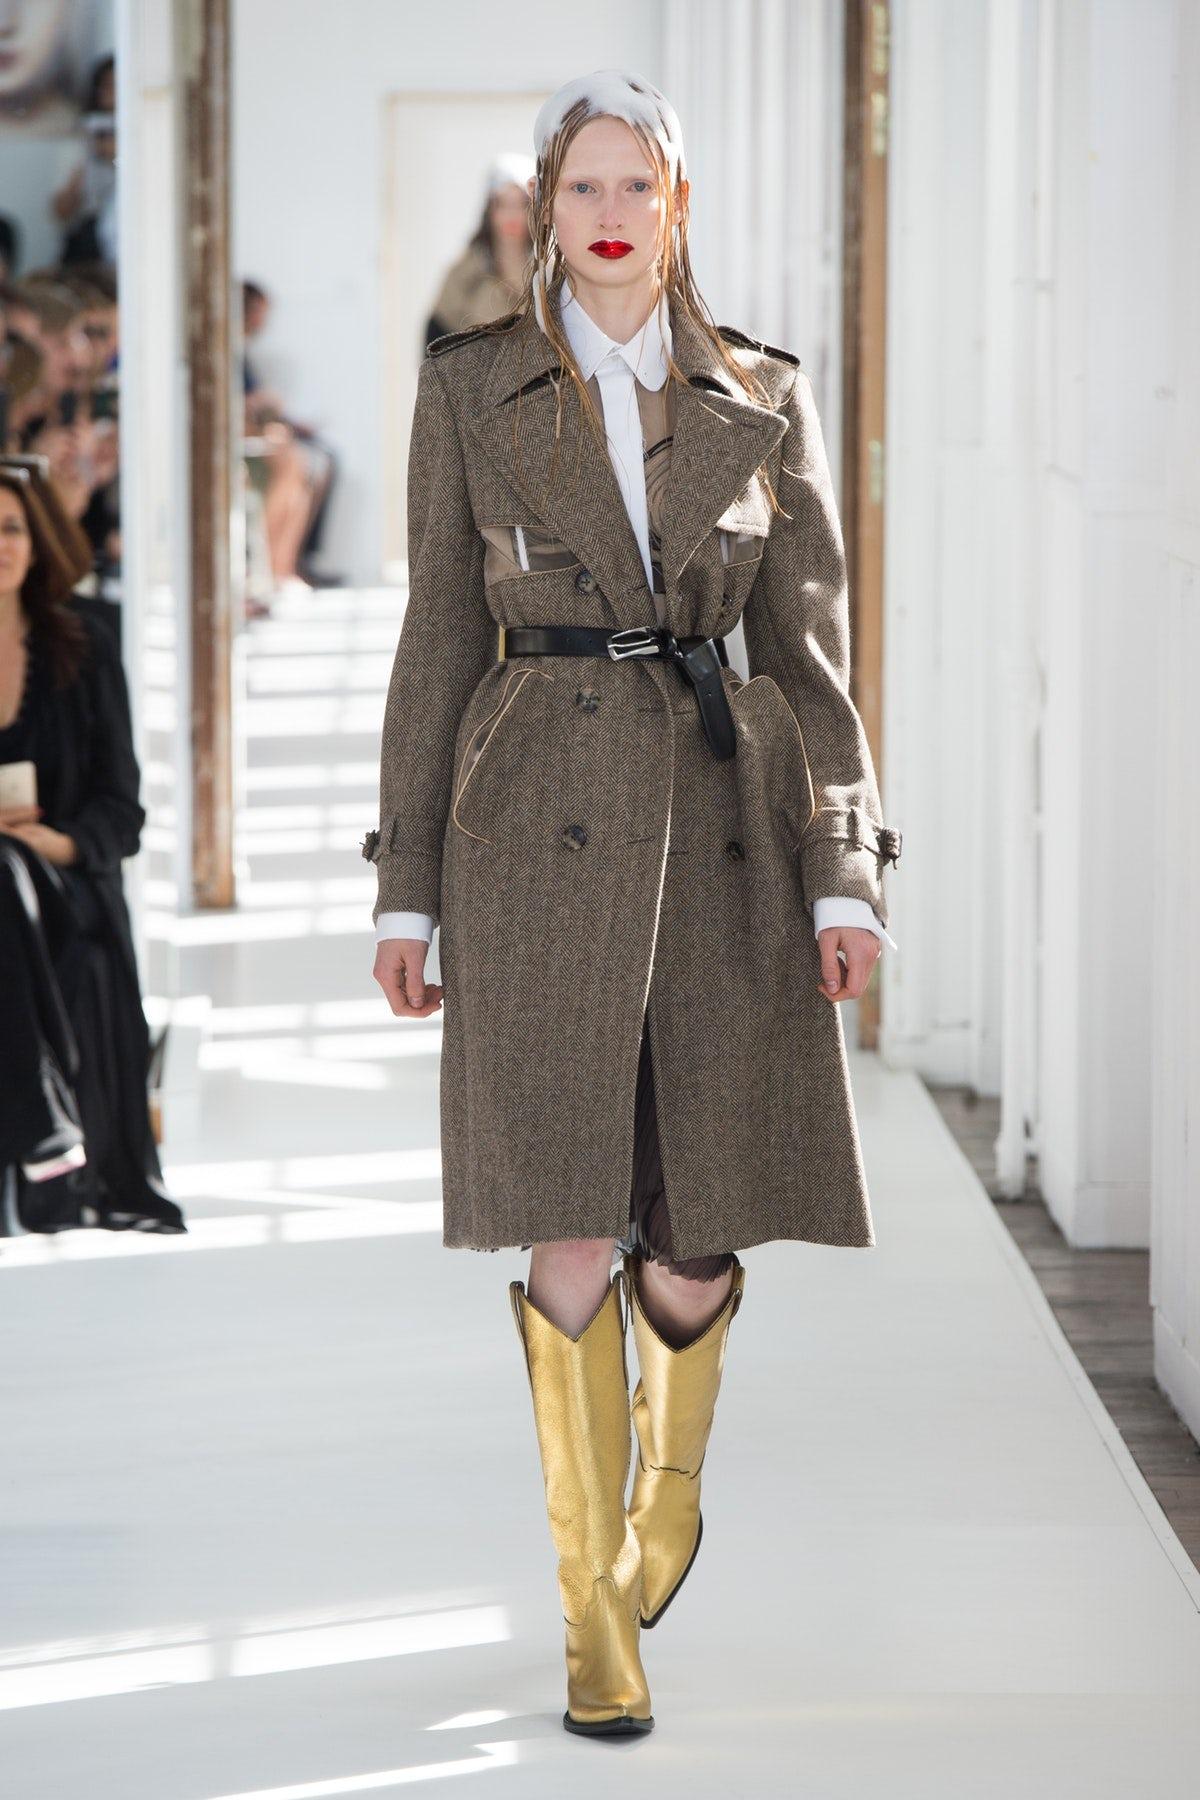 Maison Margiela Haute Couture Autumn 2018 | Source: InDigital.tv